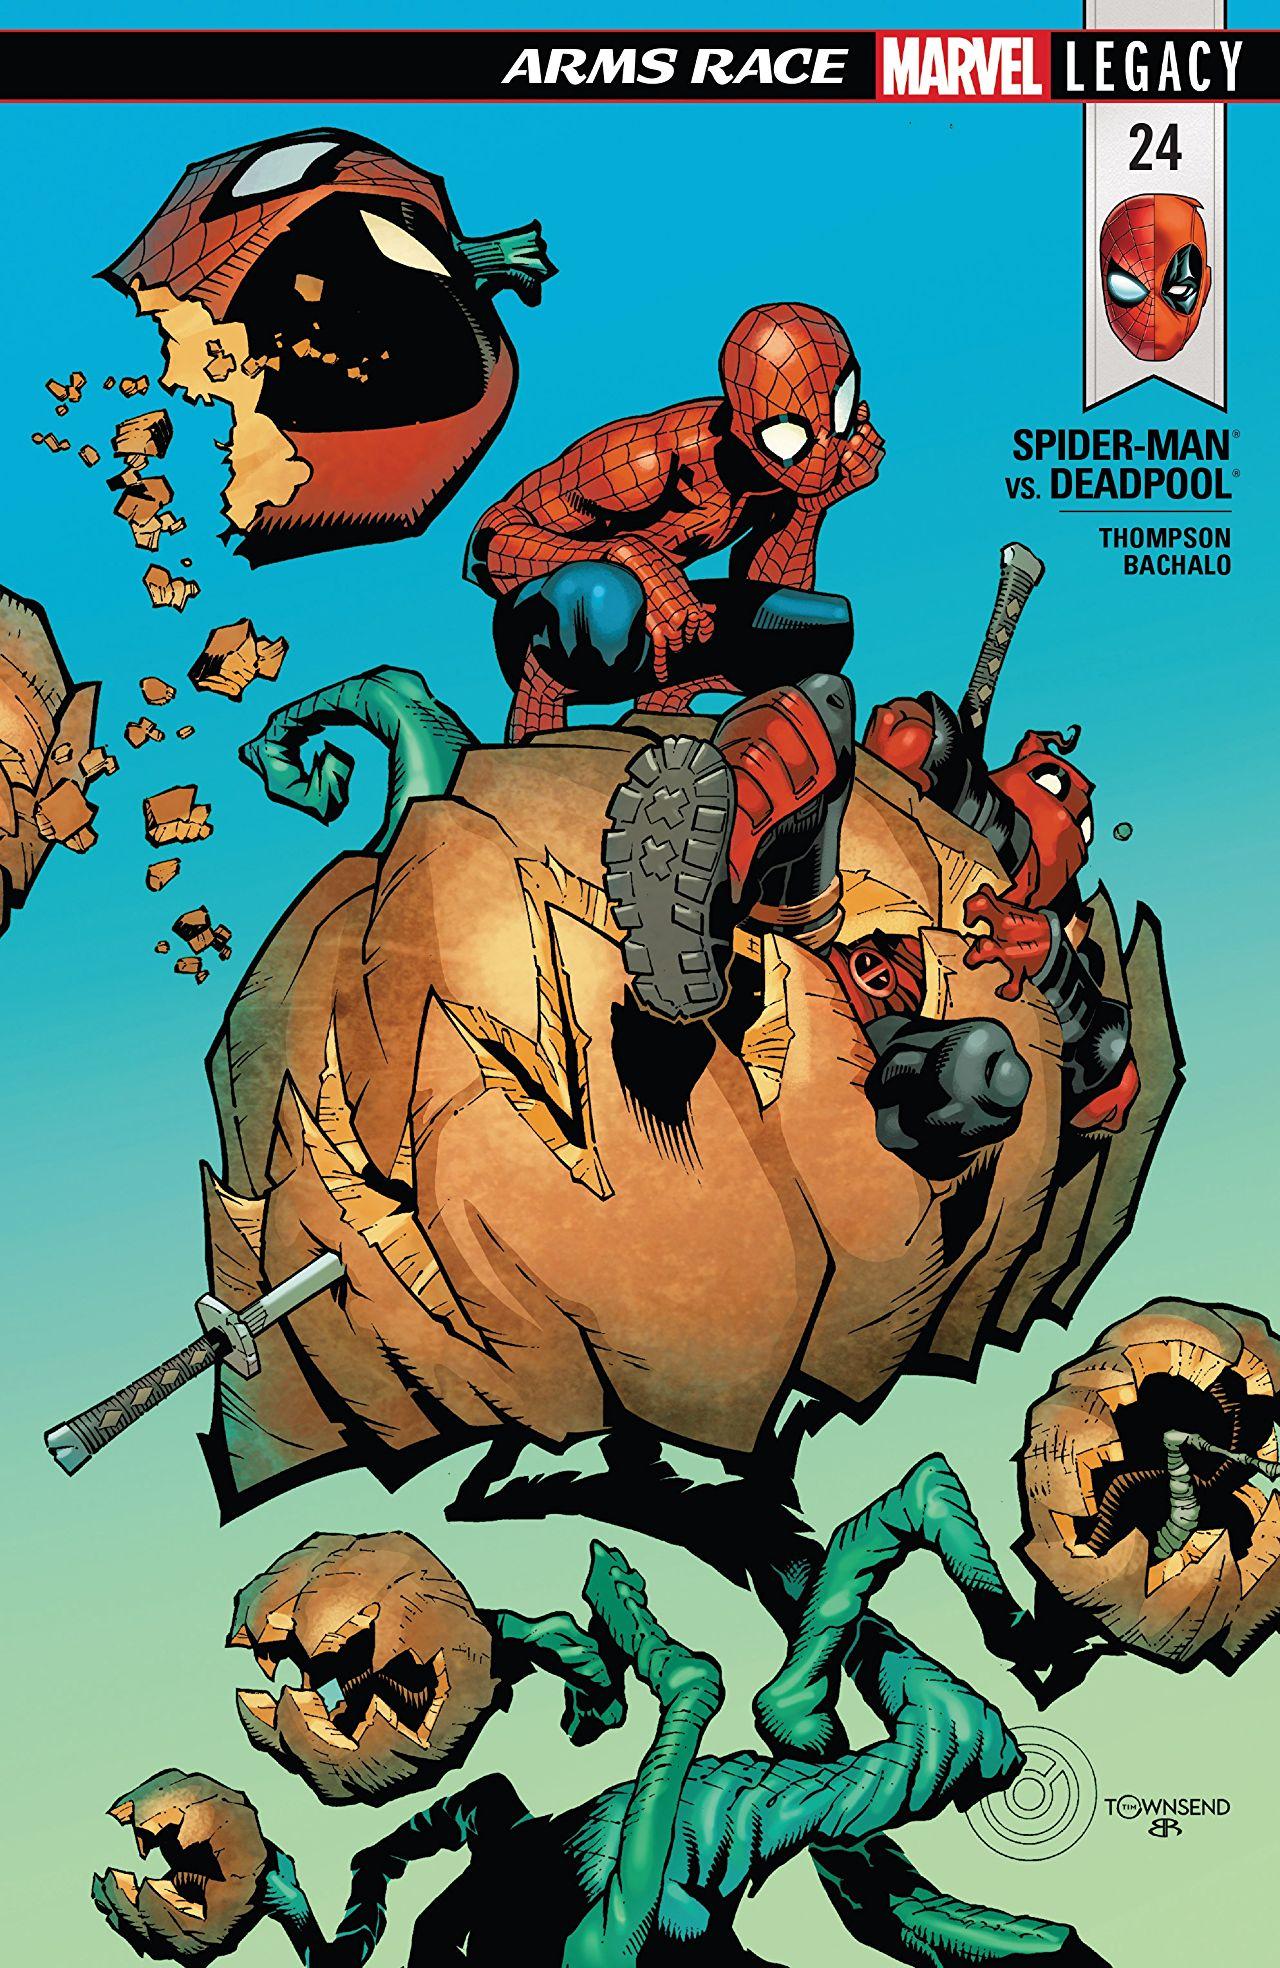 Spider-Man / Deadpool 24 - Arms Race Part 1